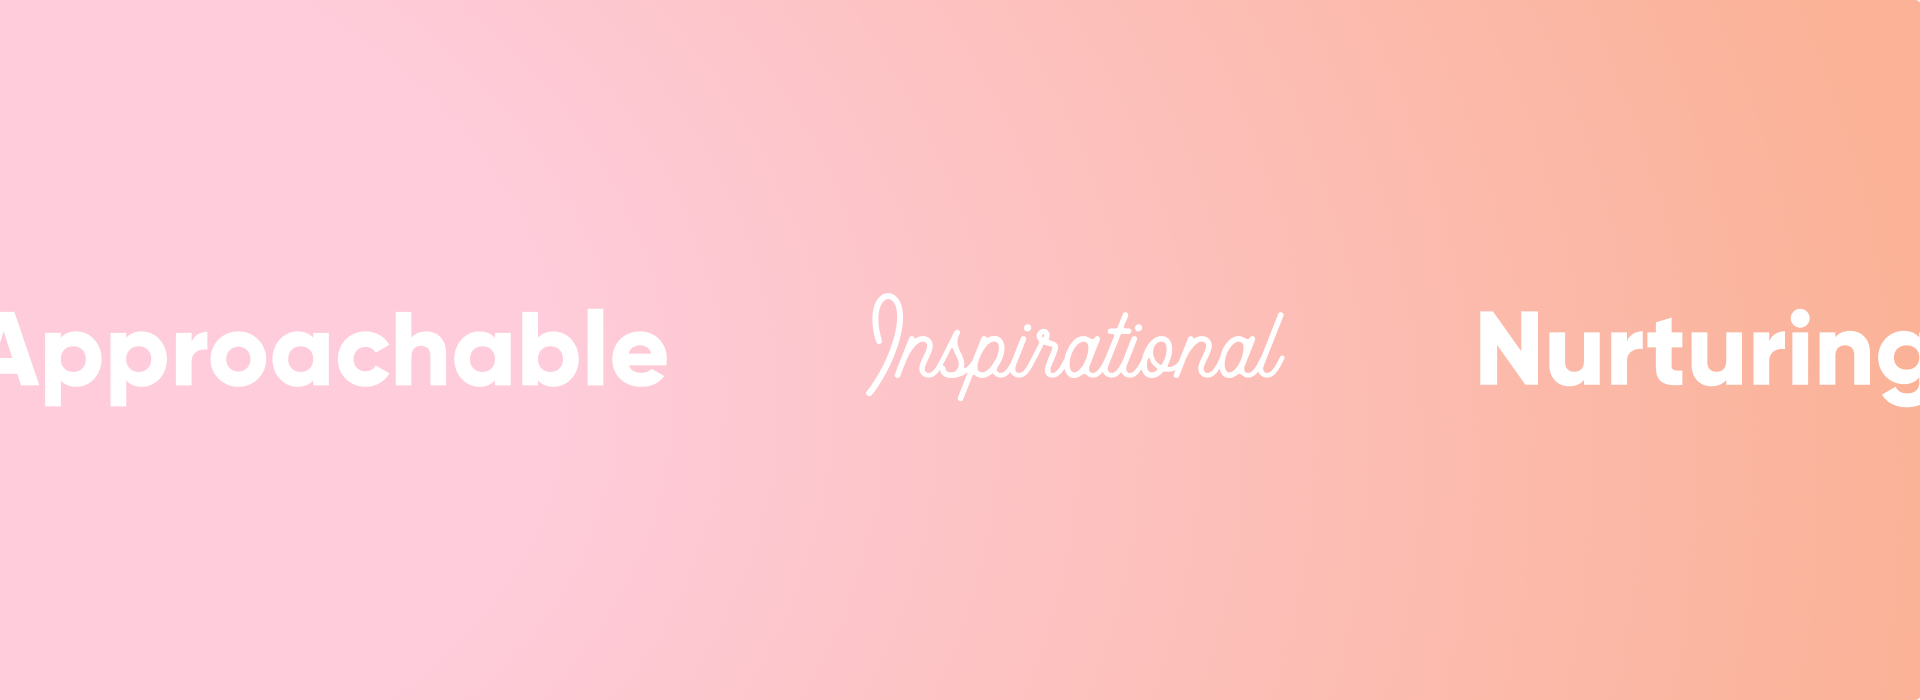 brand personality keyword